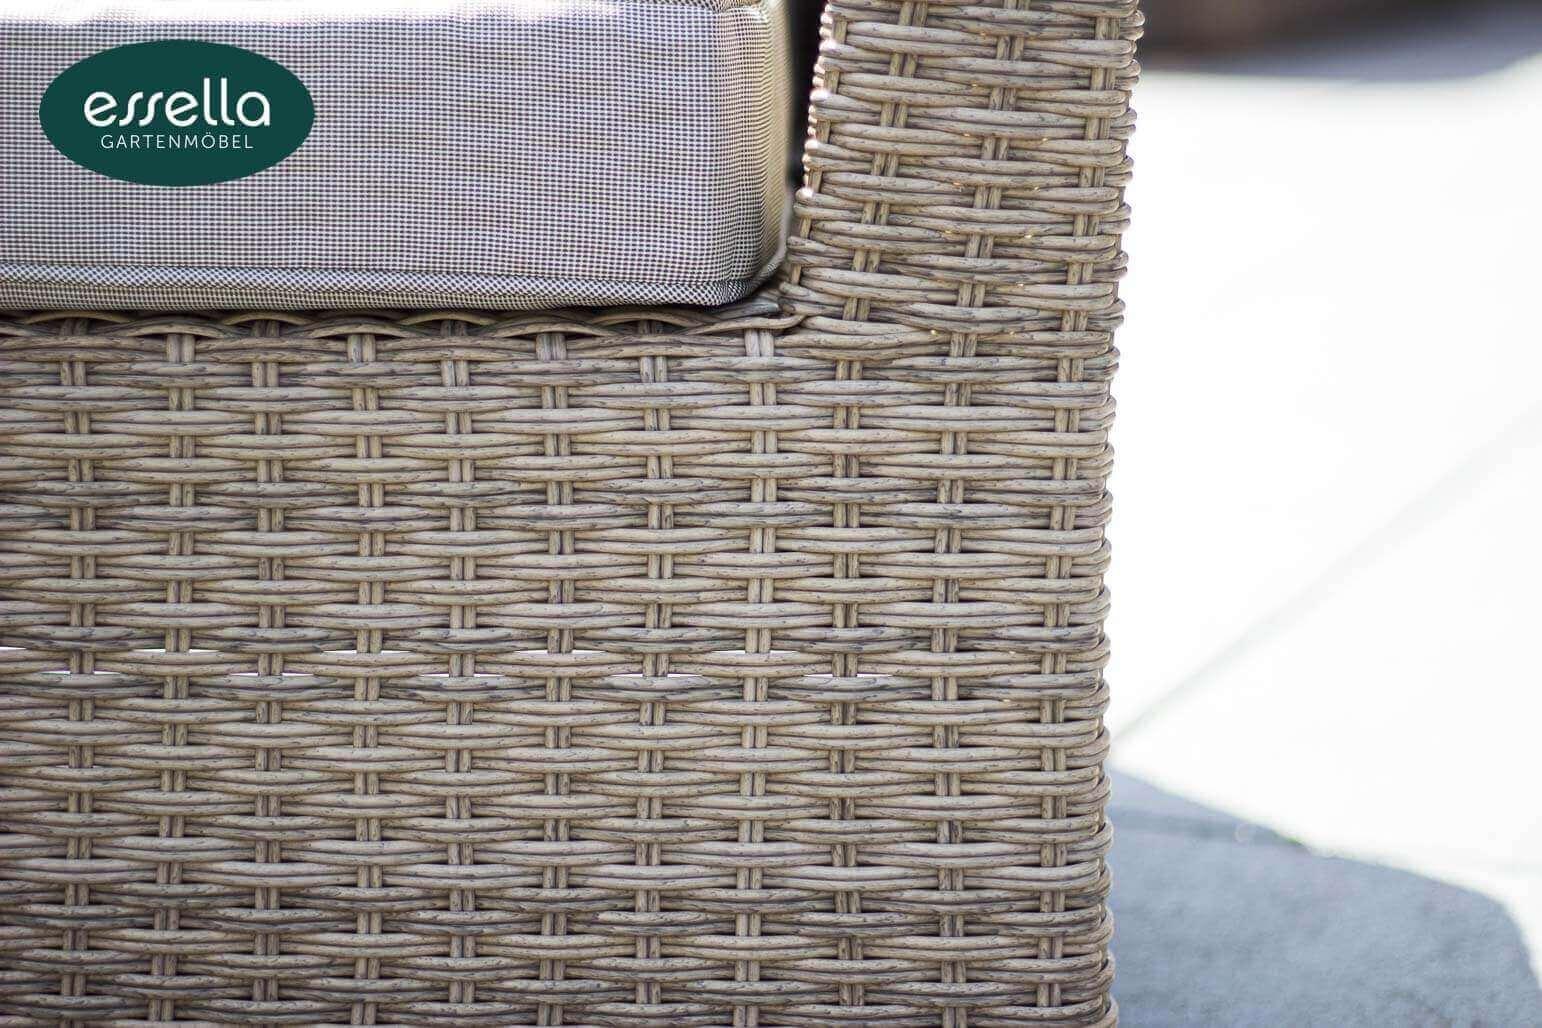 essella polyrattan loungemoebel sitzgruppe venezia hell braun halbrundgeflecht detail 01